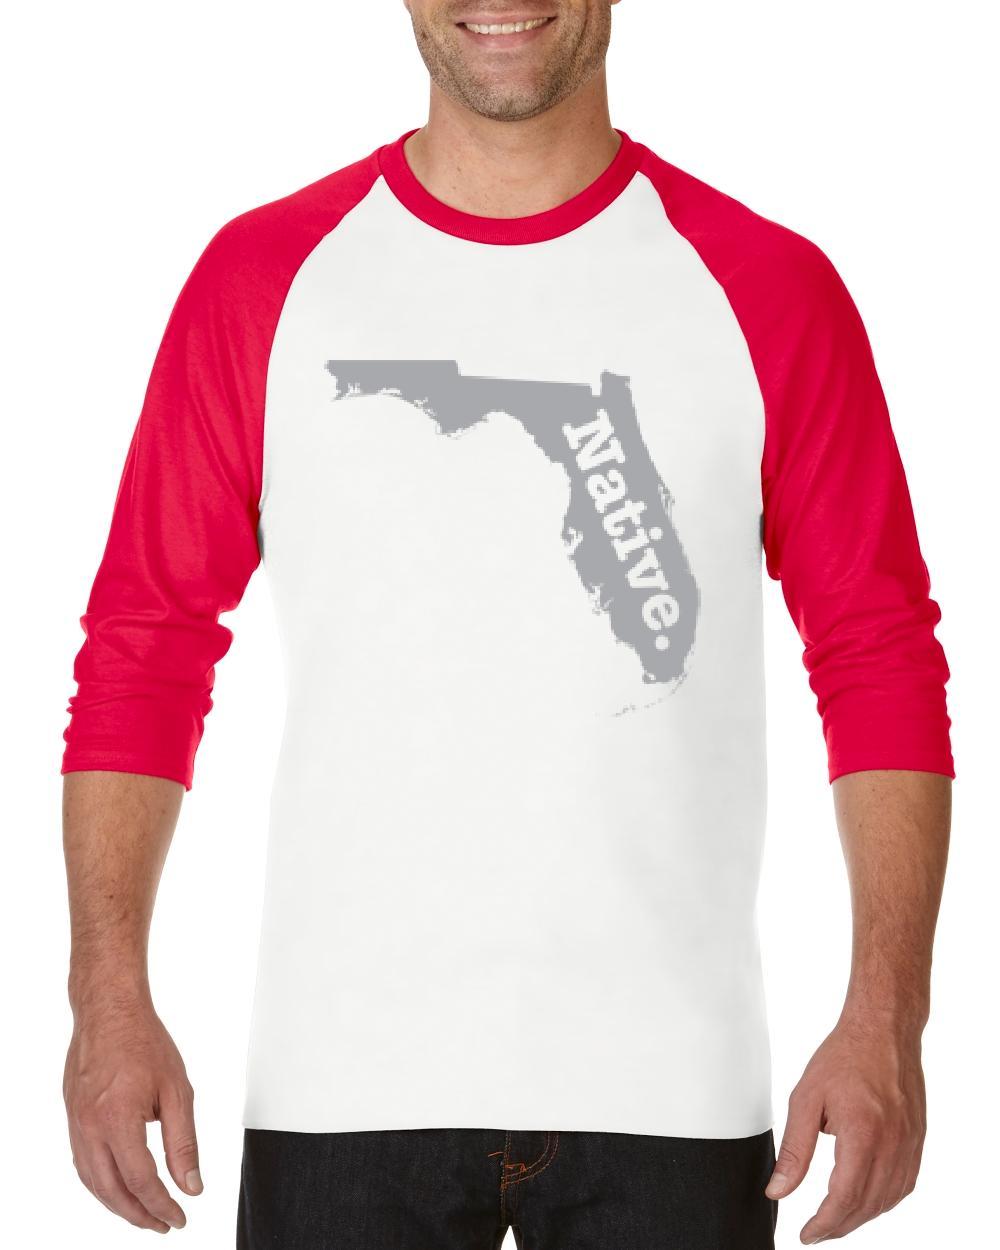 US States Florida Miami Orlando Guide Home of University of Florida UF Women's Raglan Sleeve Baseball T-Shirt by